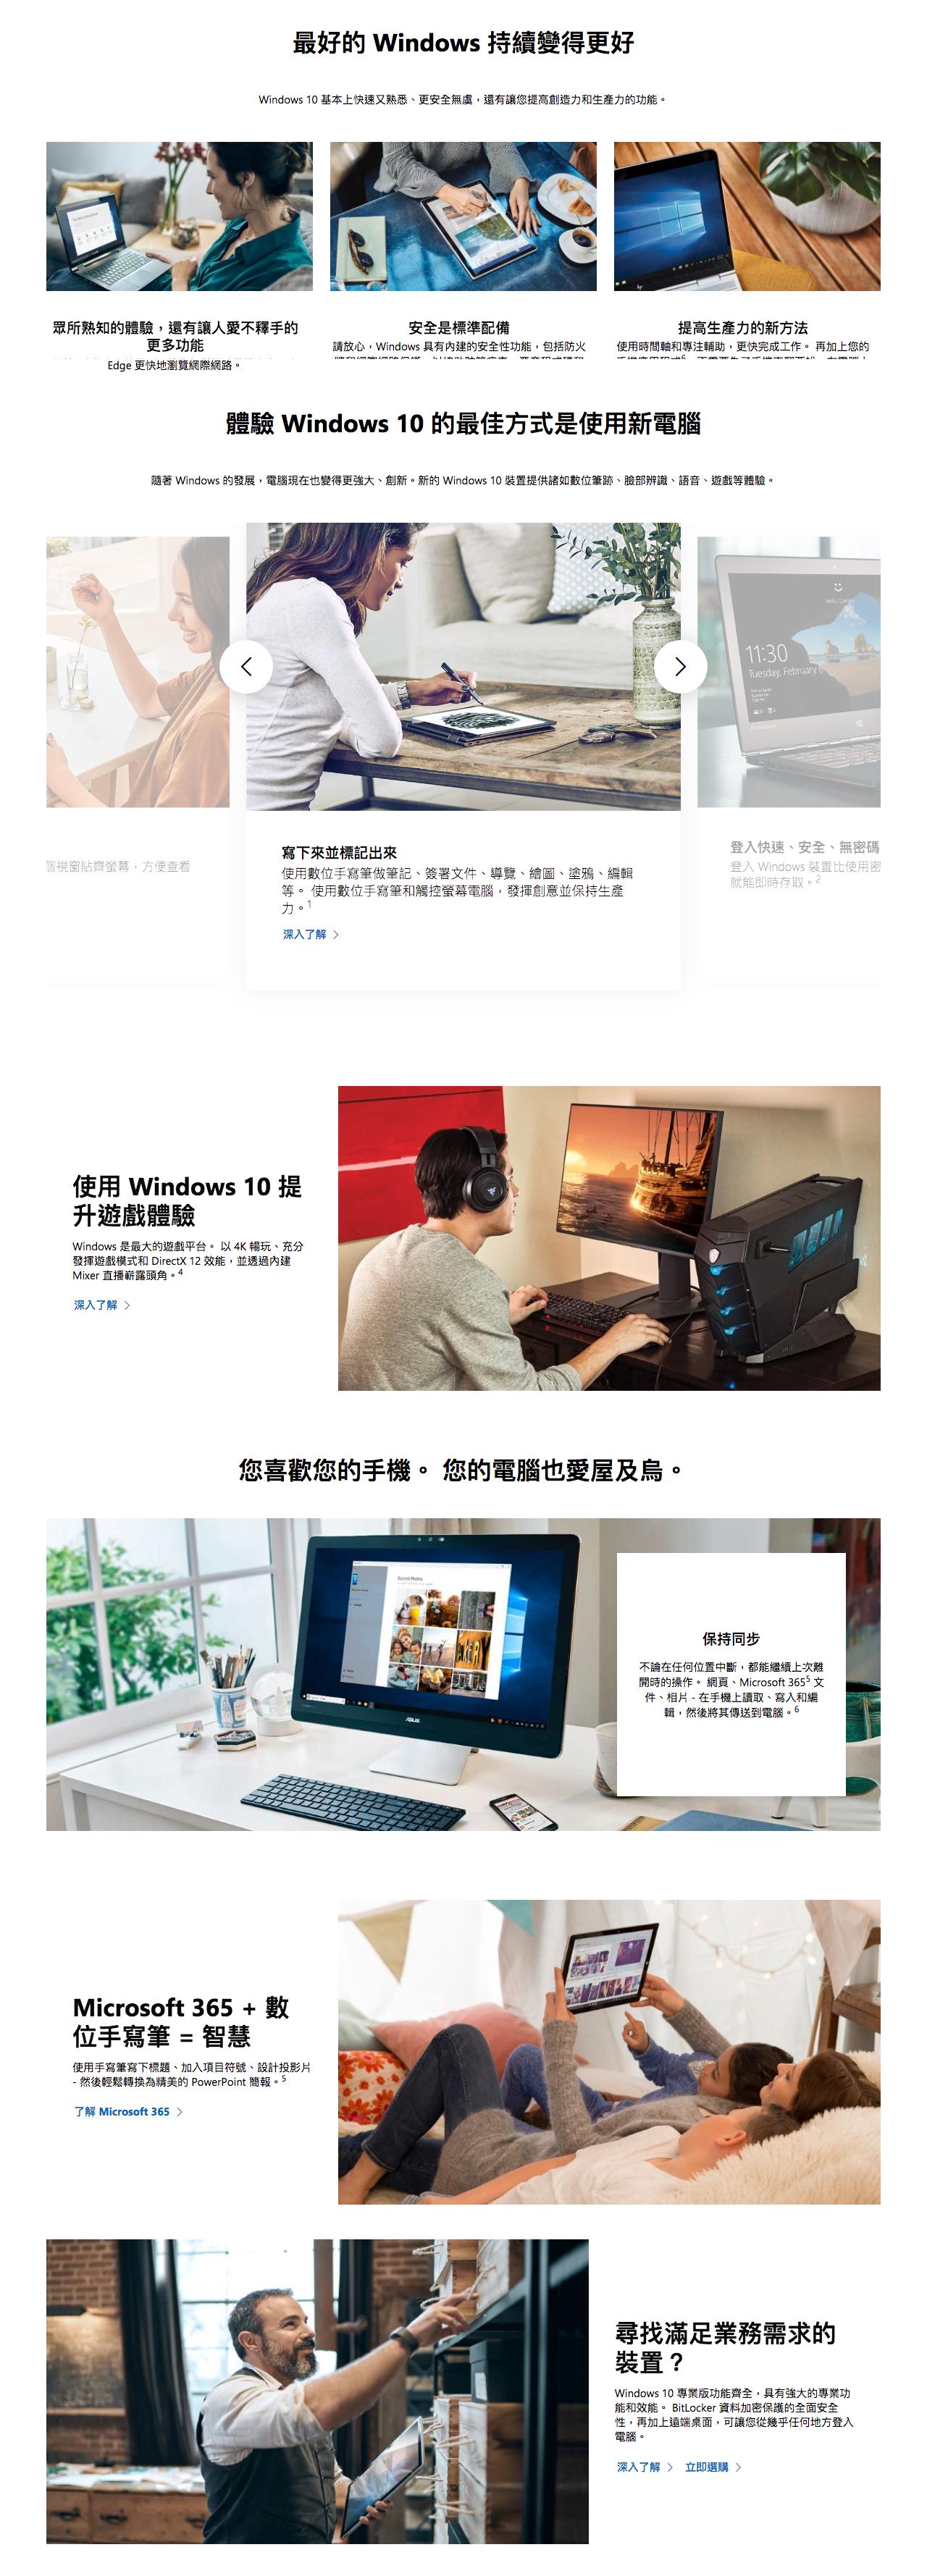 microsoft office 家用 版 與 學生 版 2019